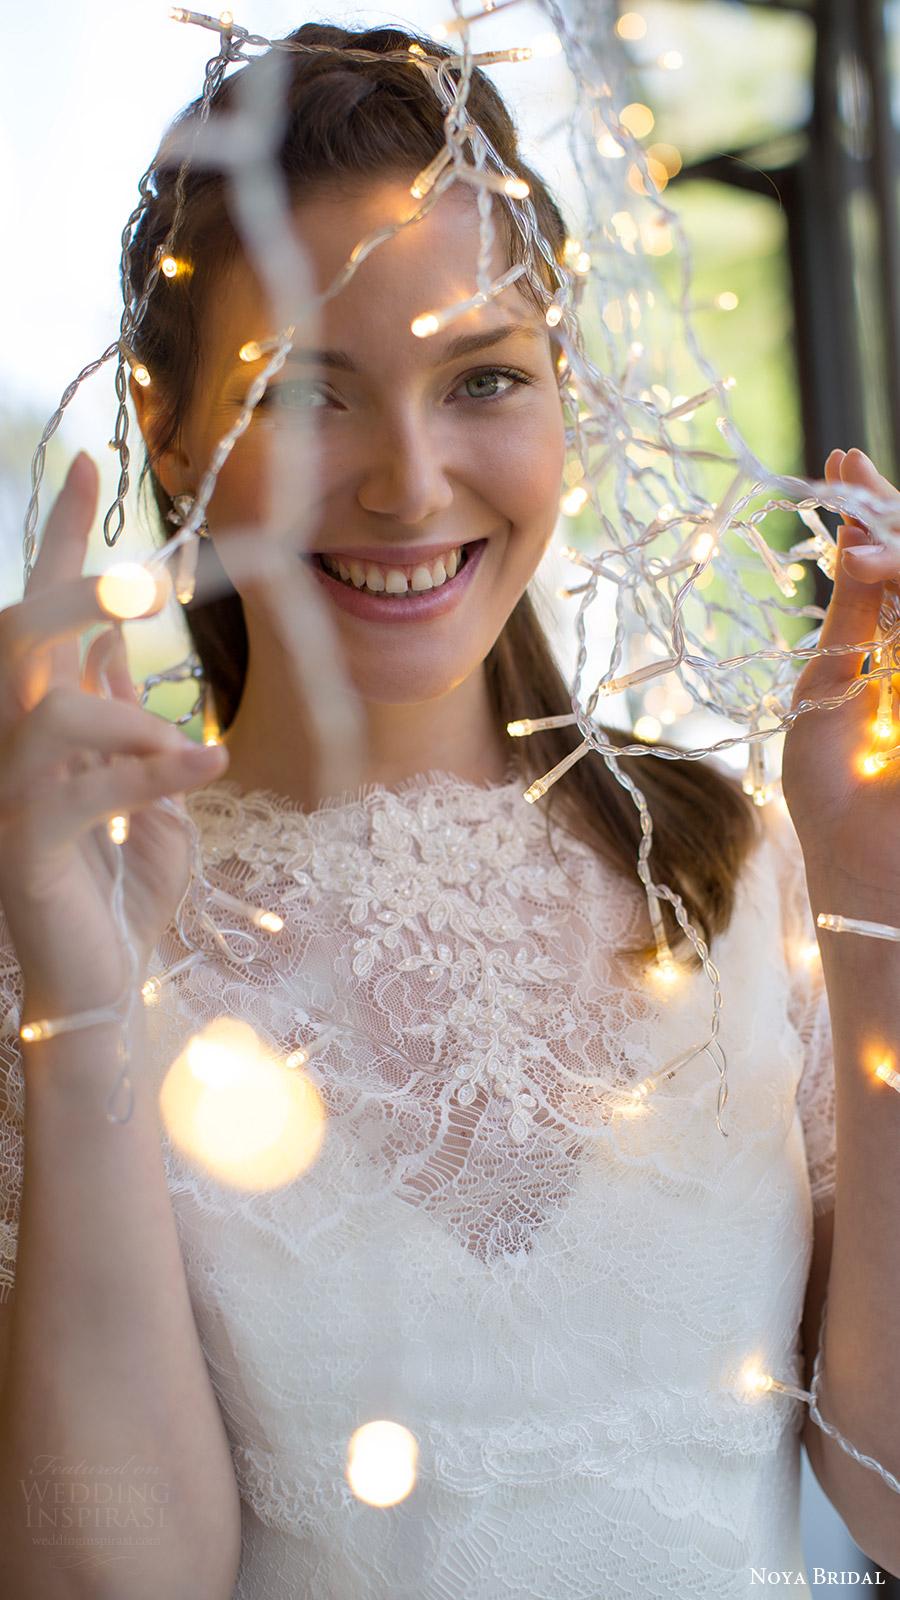 noya bridal 2016 sleeveless v neck illusion jewel lace mermaid fit flare wedding dress (1211) zv romantic shortsleeve top